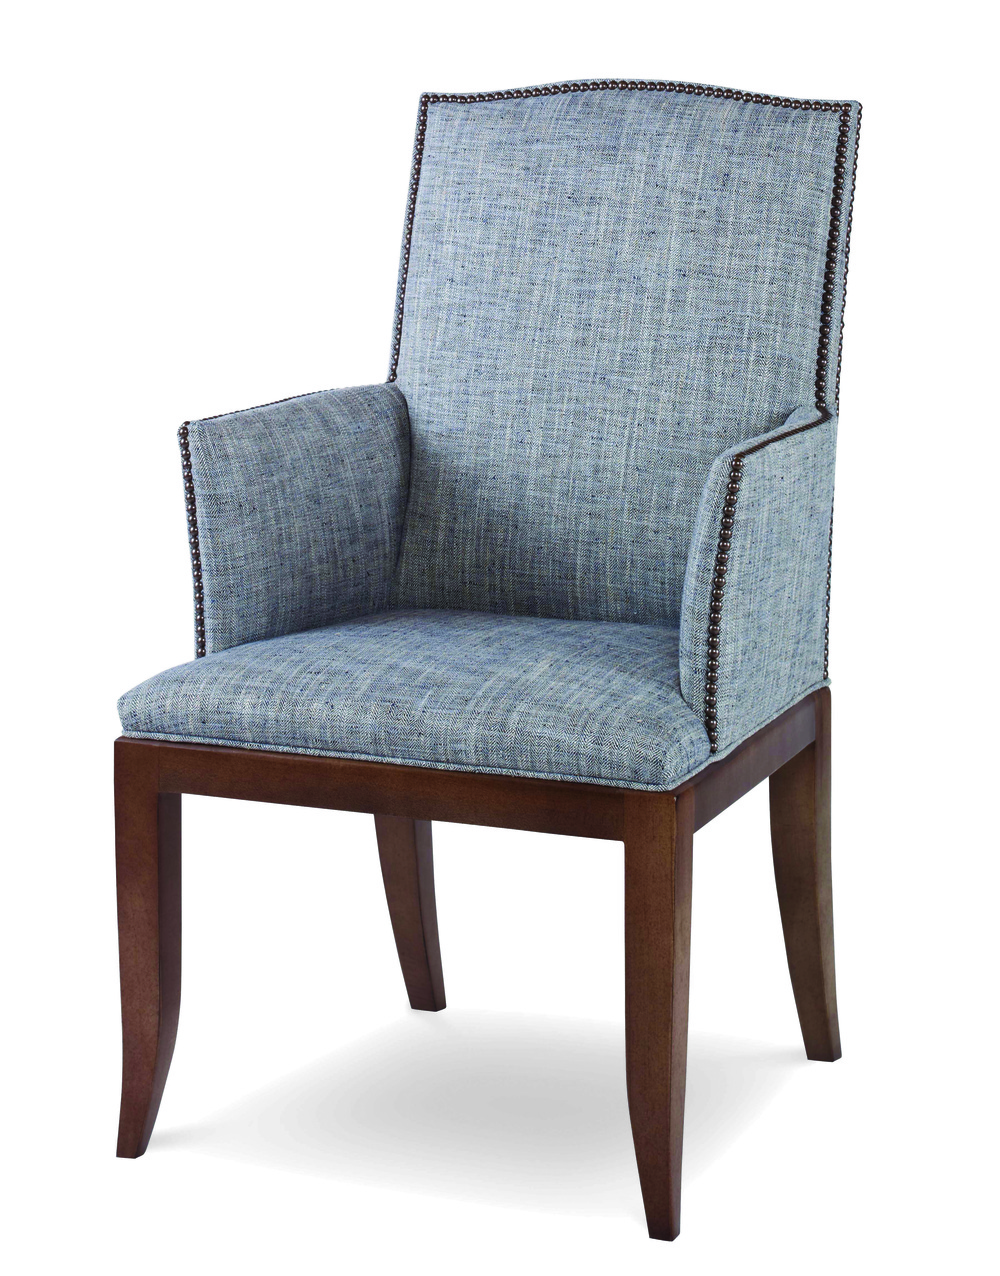 Century Furniture - Chelsea Arm Chair